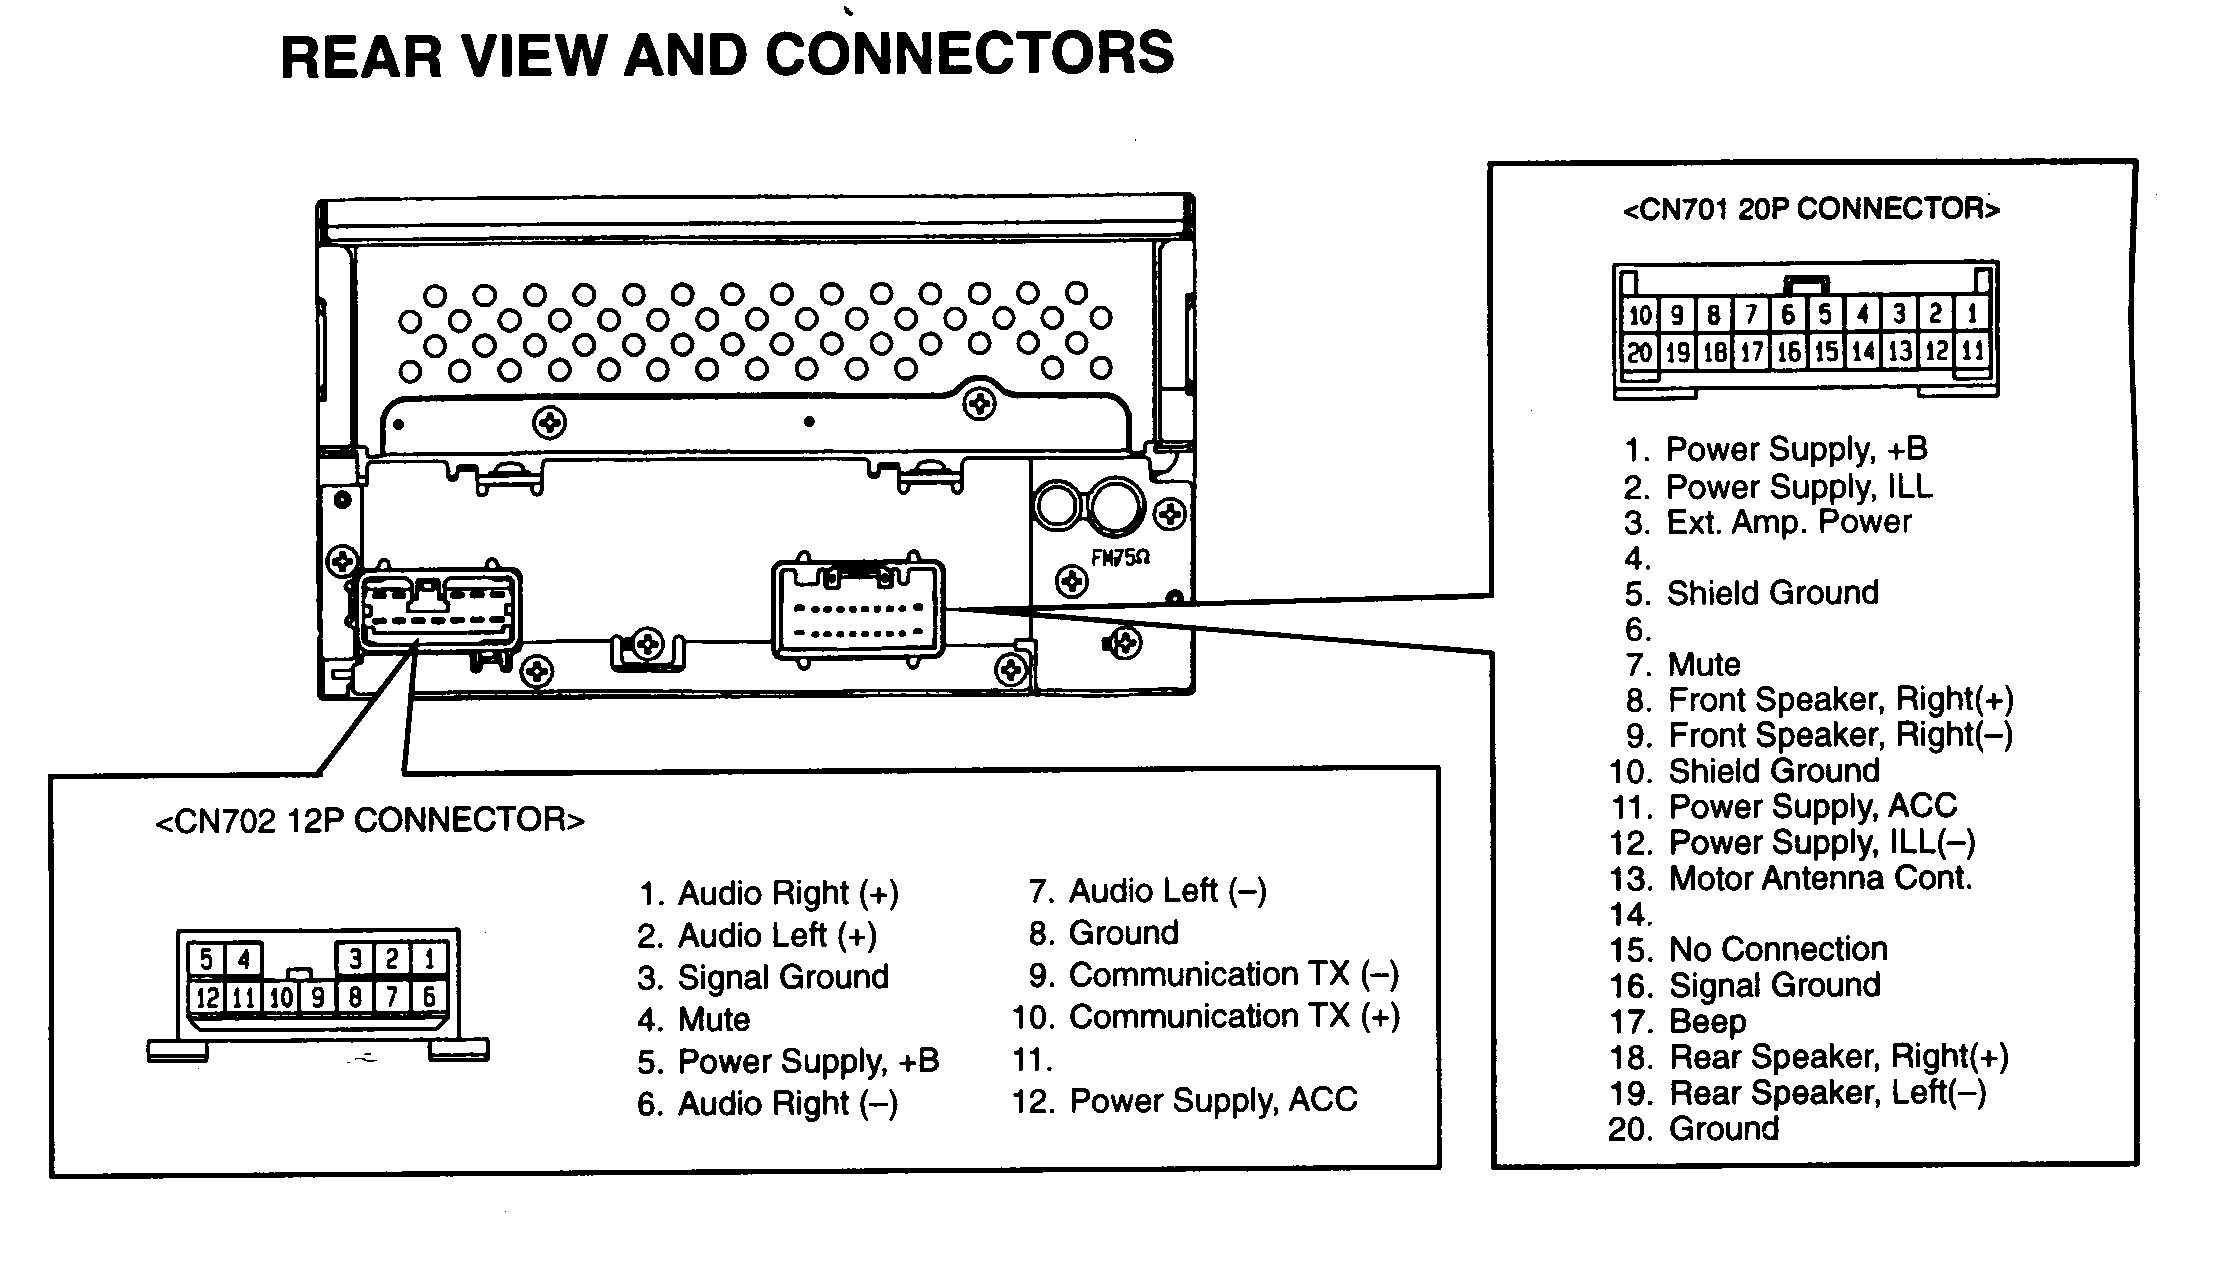 Unique Auto Wiring Repair Diagram Wiringdiagram Diagramming Diagramm Visuals Visualisation Graphical Electrical Wiring Diagram Car Stereo Diagram